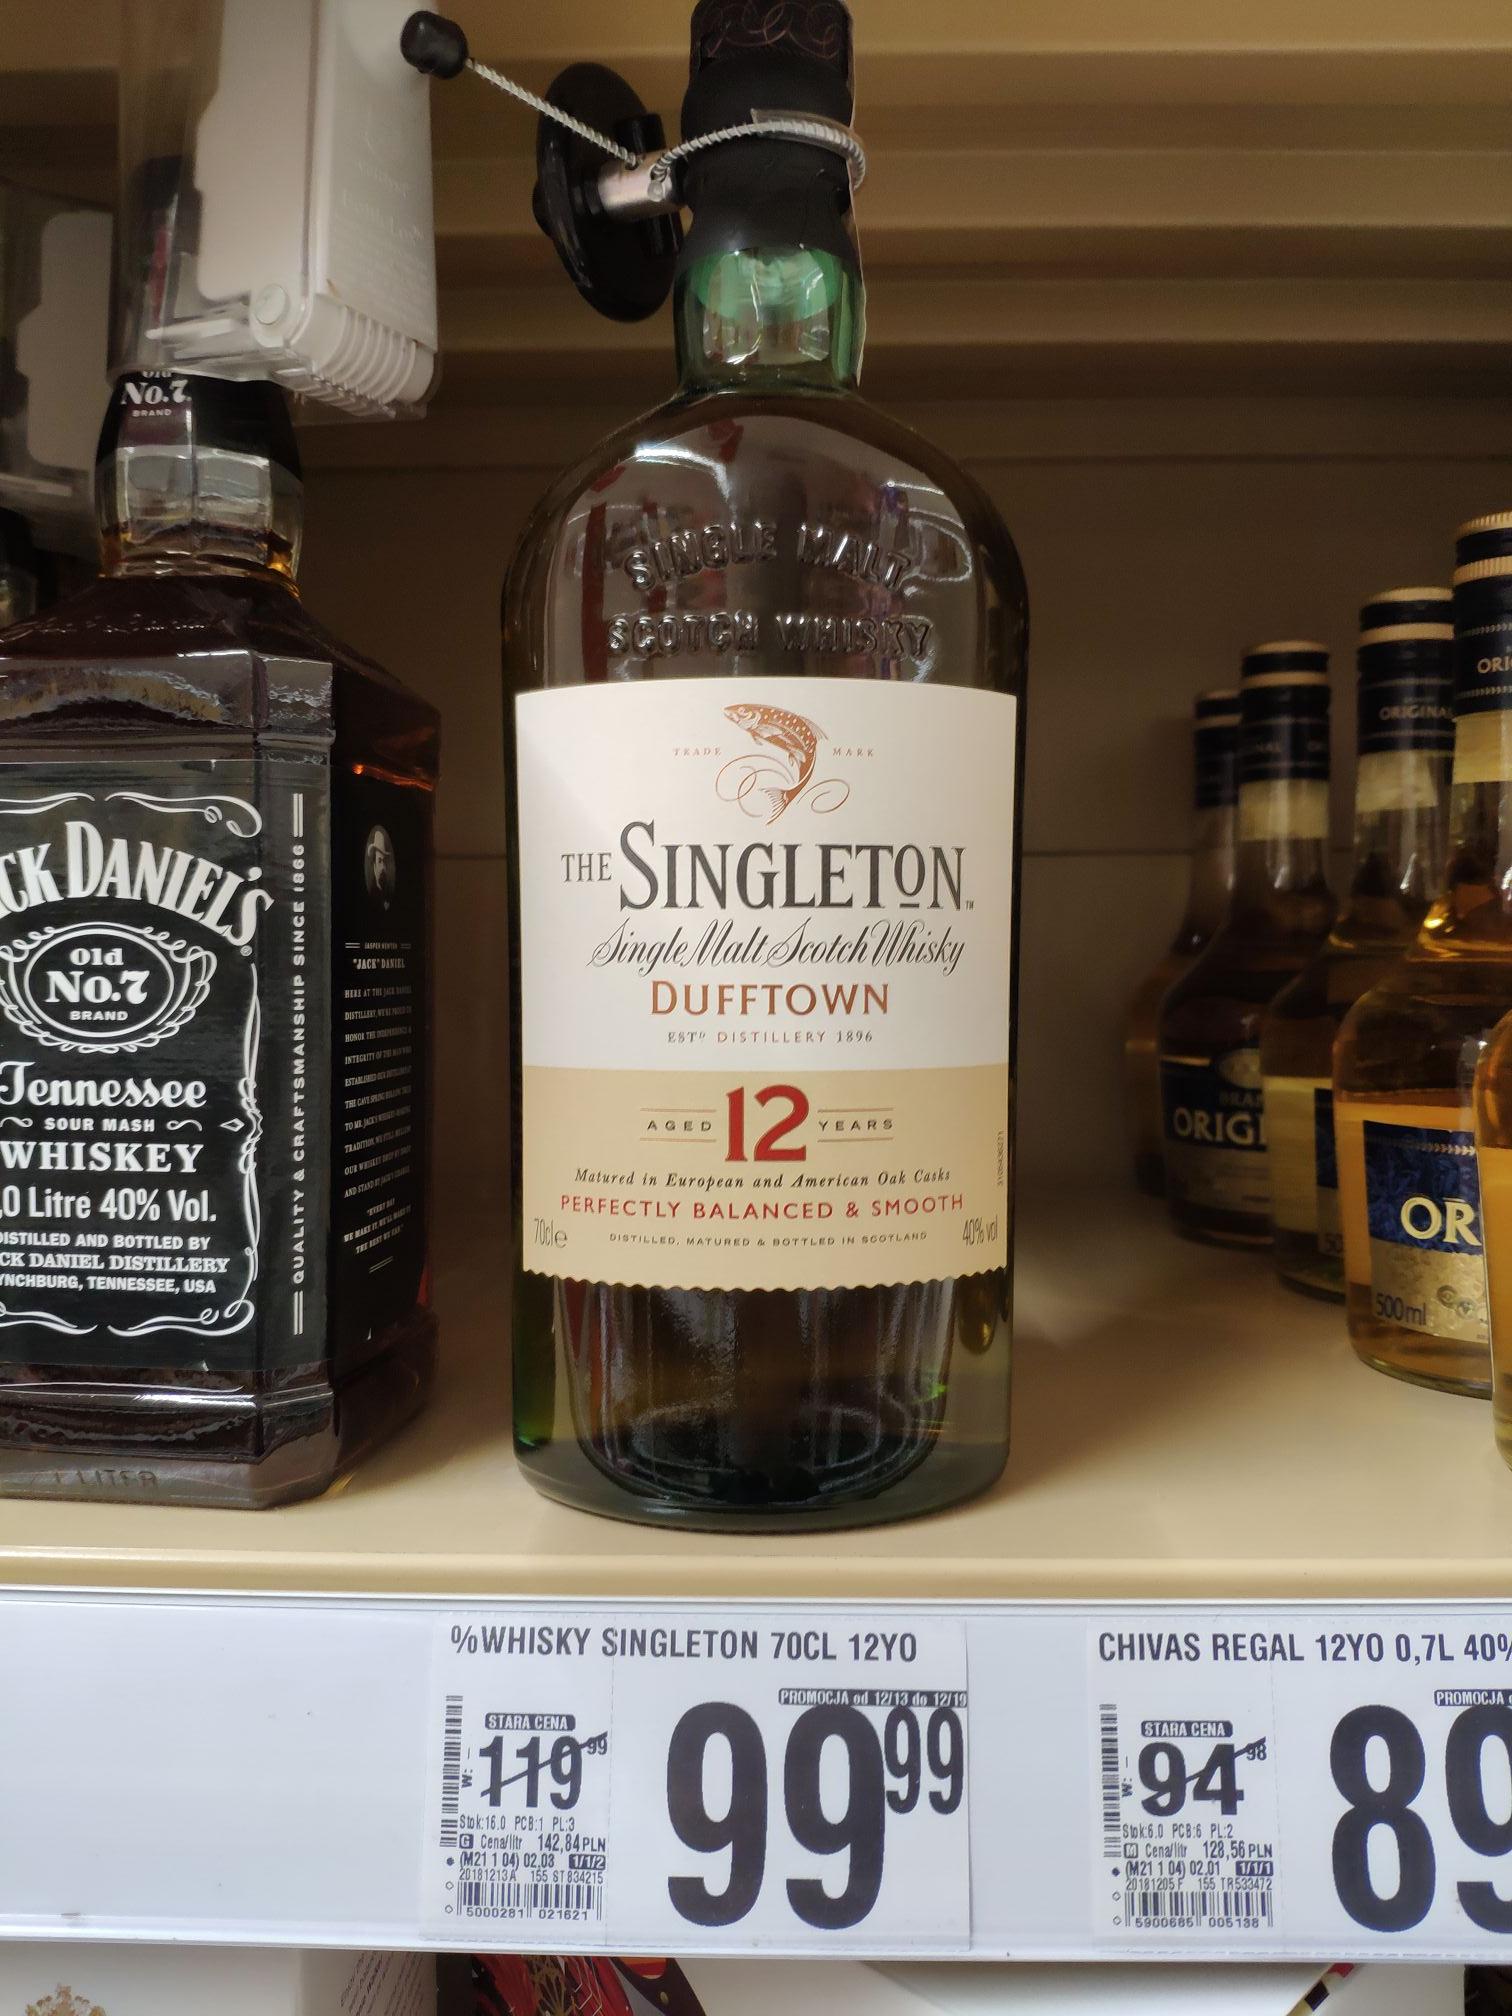 Whisky Singleton Dufftown 12YO w Auchan Hubska Wrocław